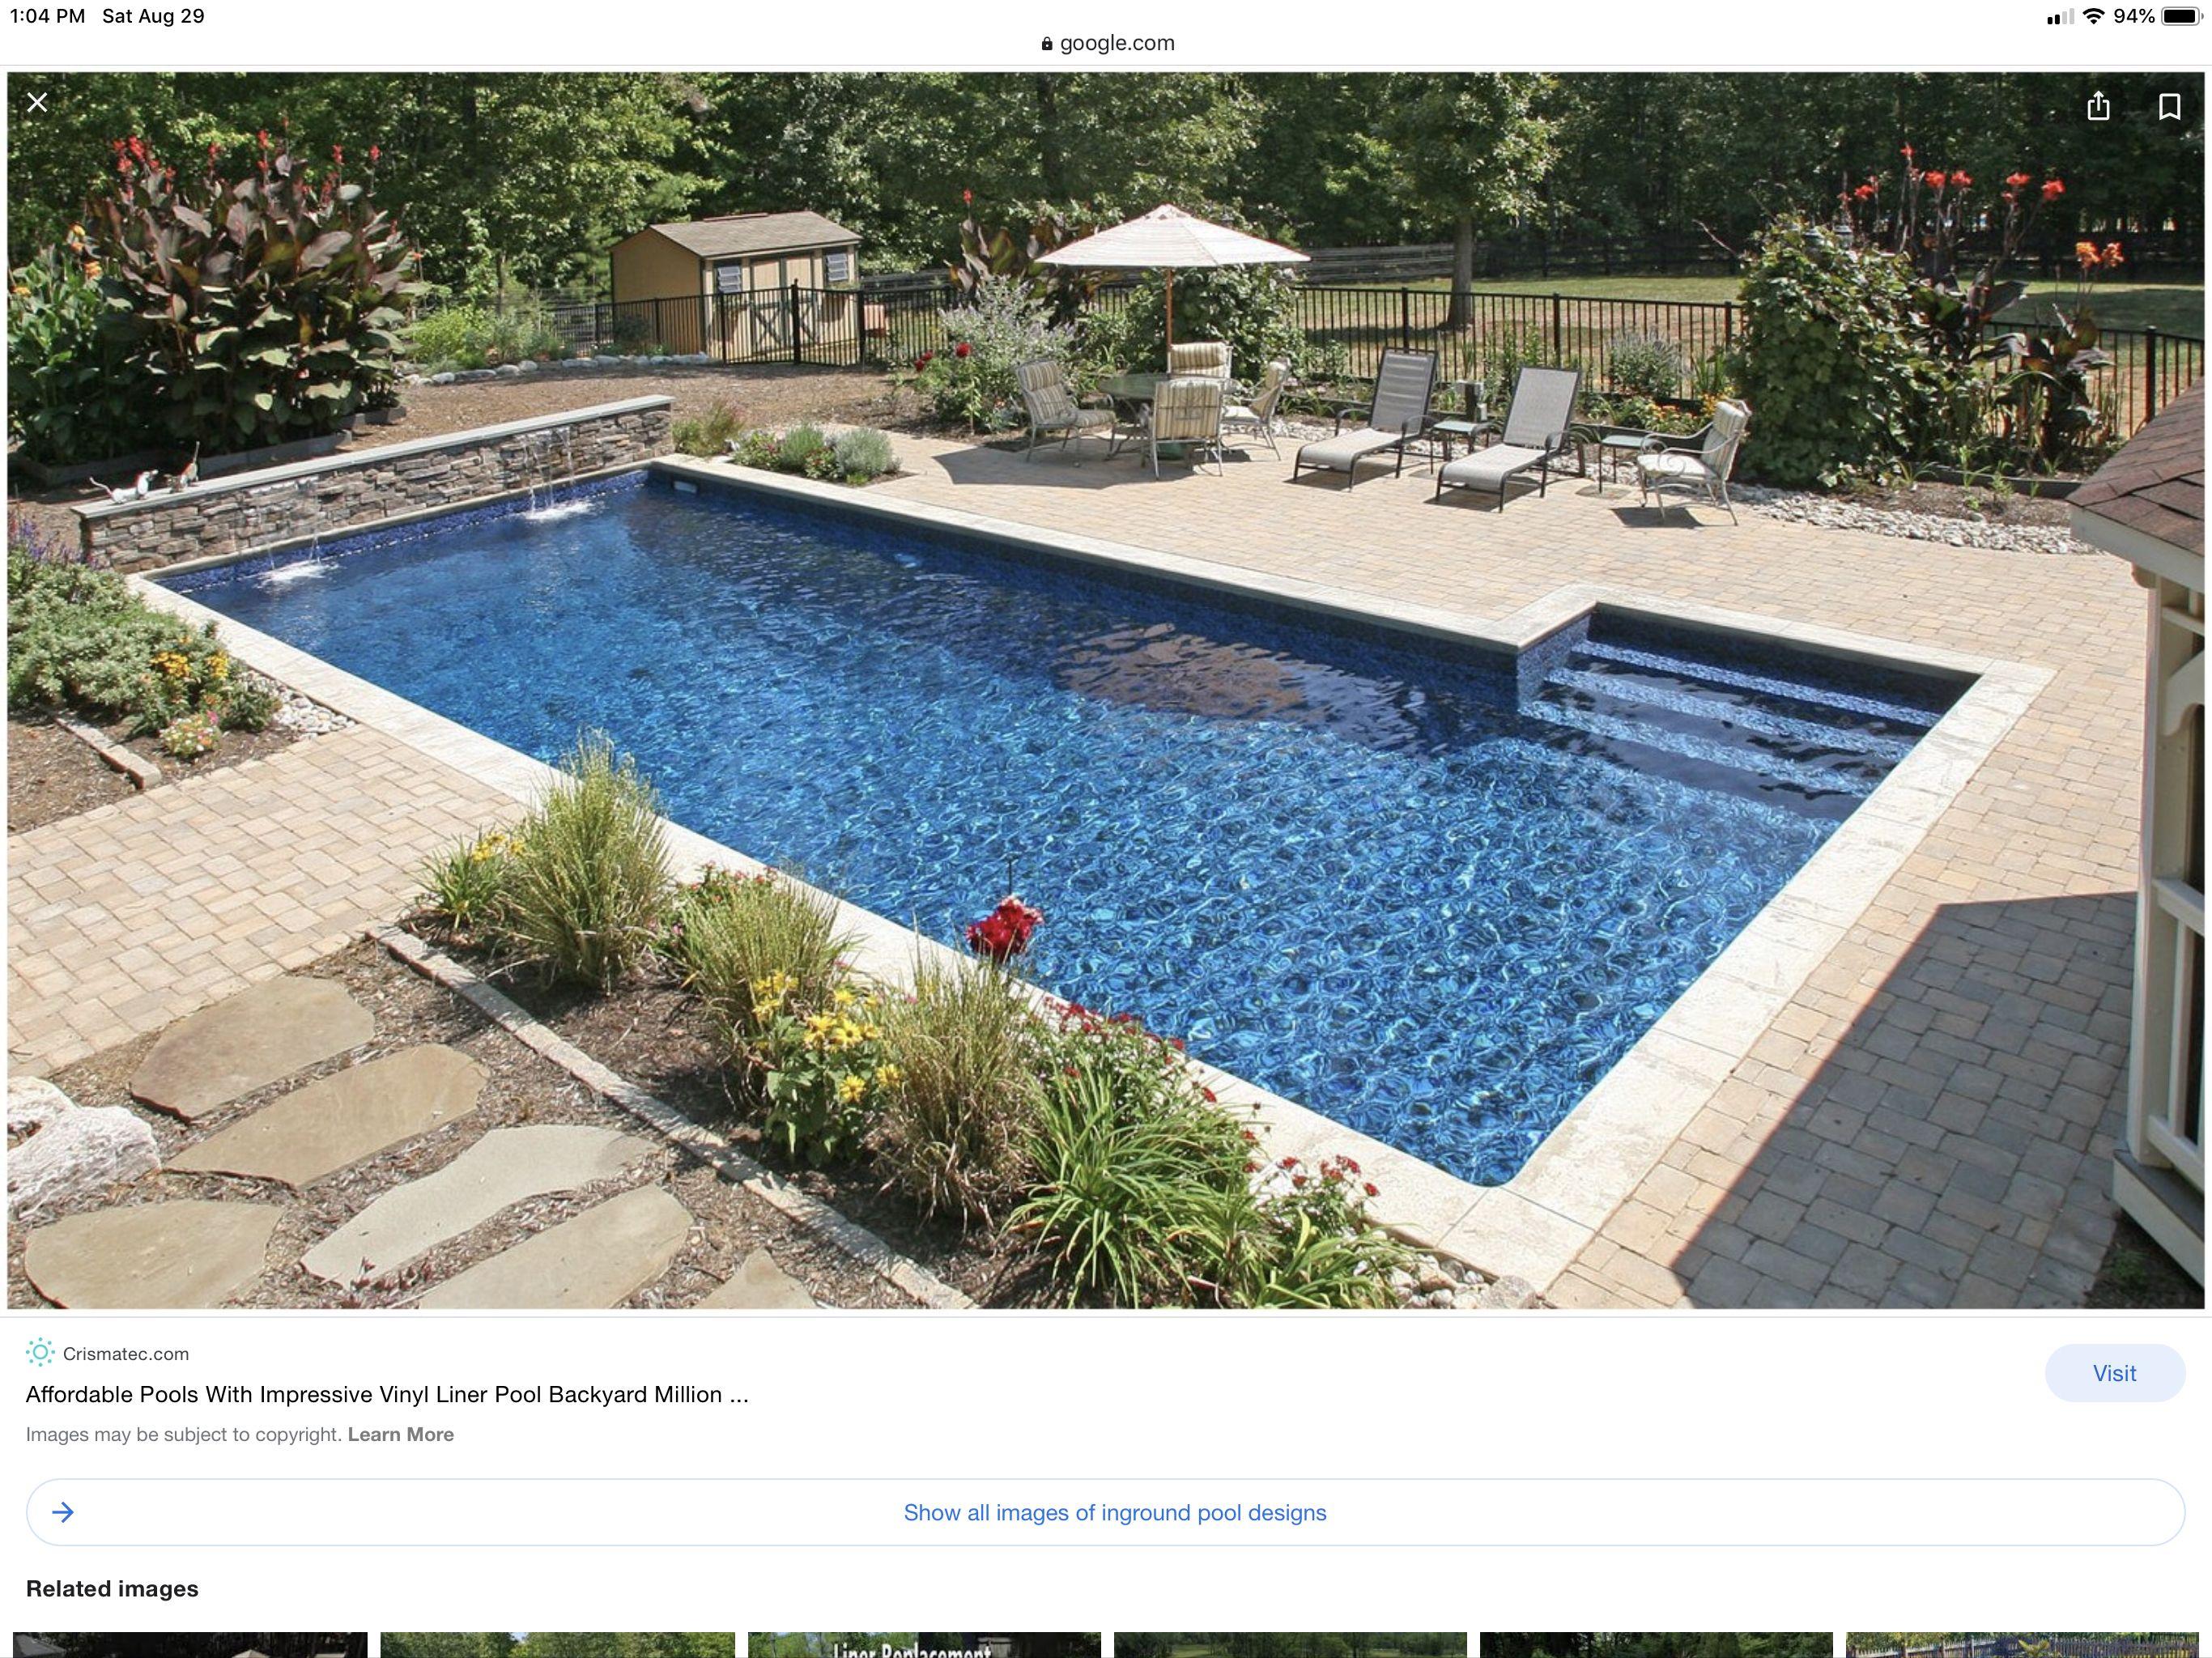 Pin By Jennifer Tonetti On Pool Pools Backyard Inground Backyard Pool Landscaping Backyard Pool Designs